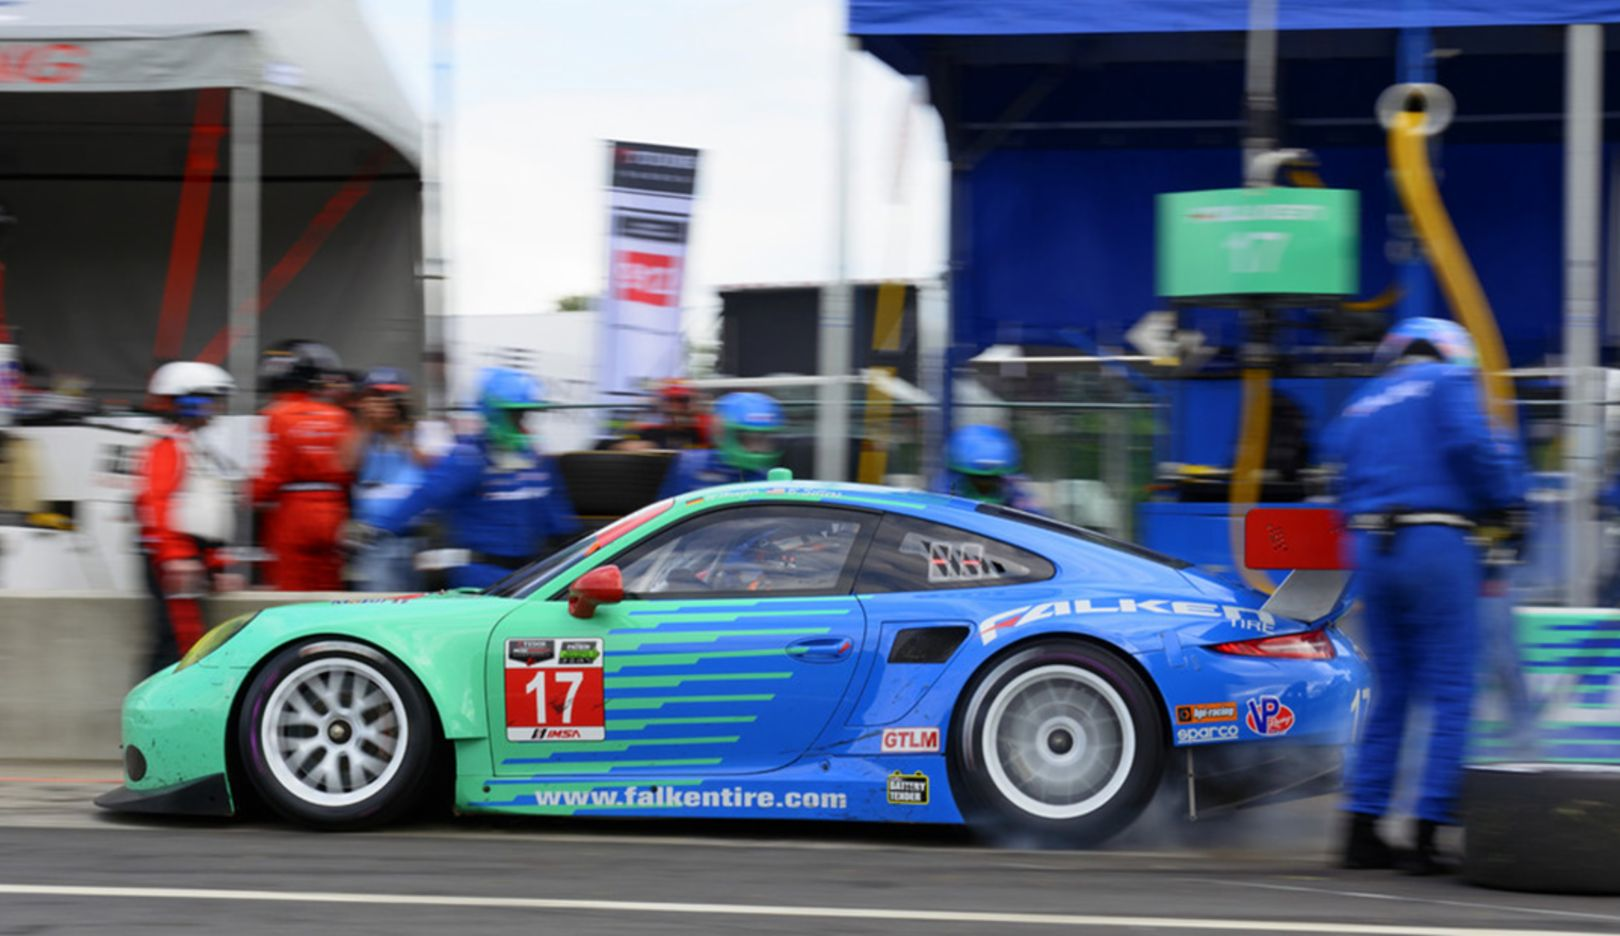 Tudor United SportsCar Championship, 9. Lauf in Alton, USA, 2014, Porsche AG